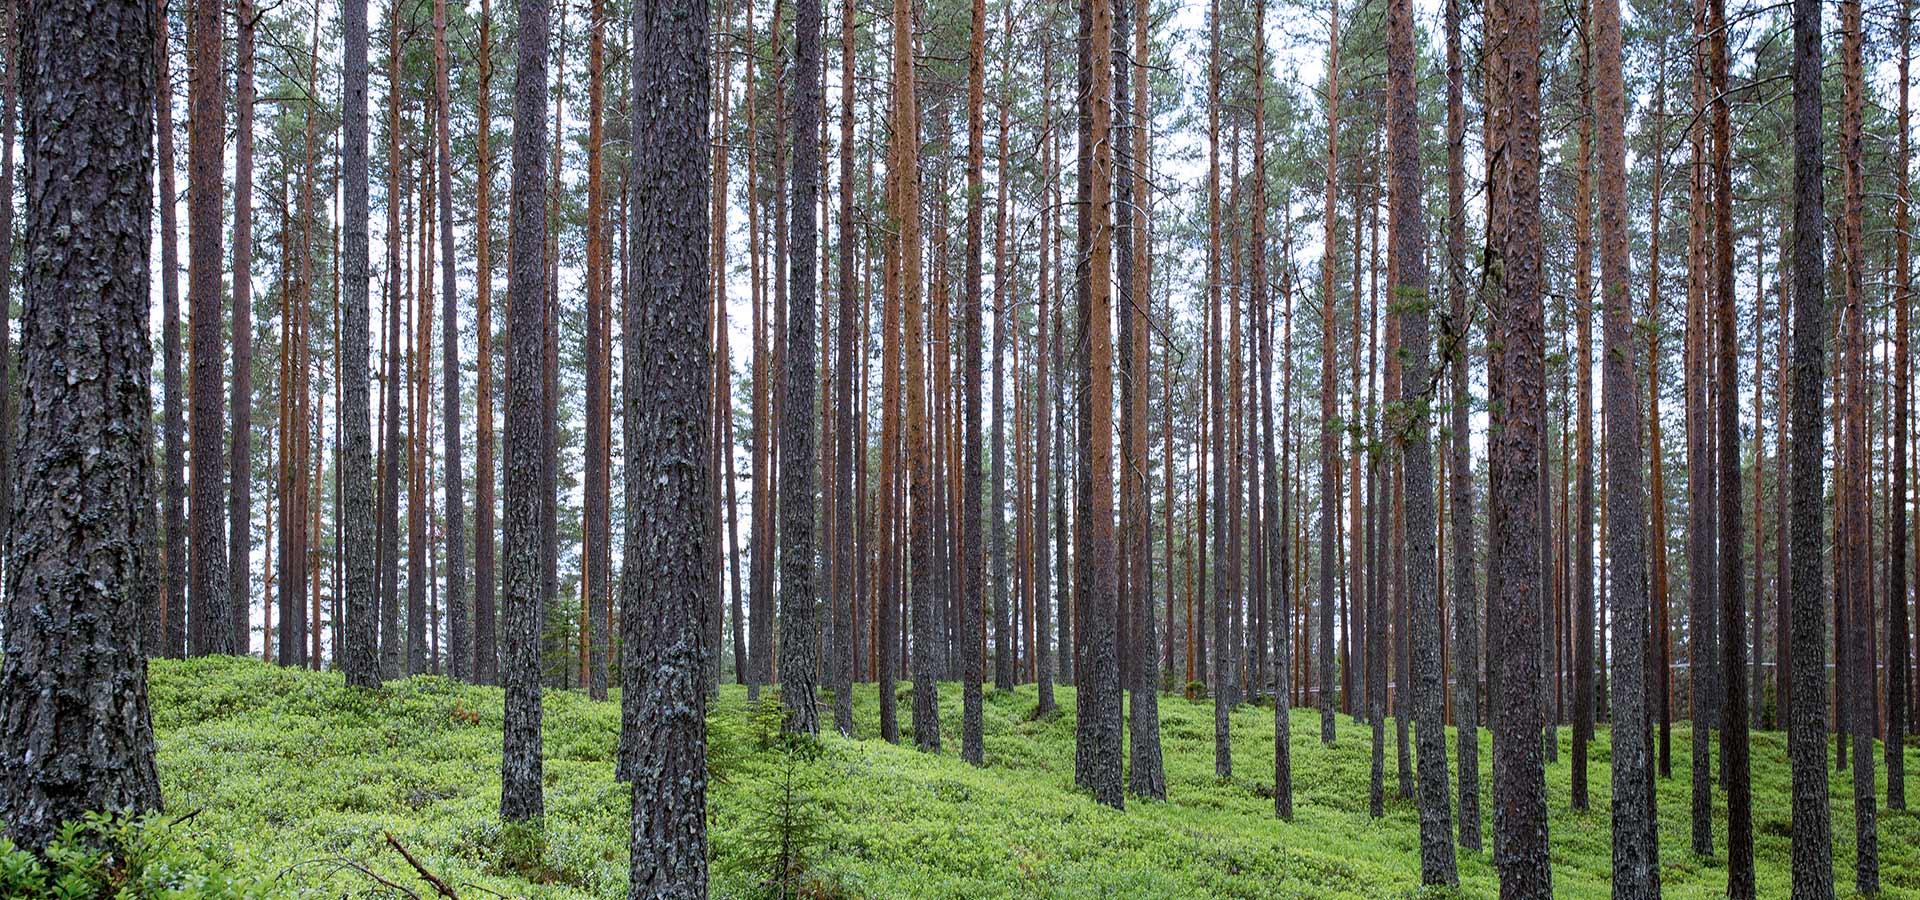 optimization-wood-resources-17